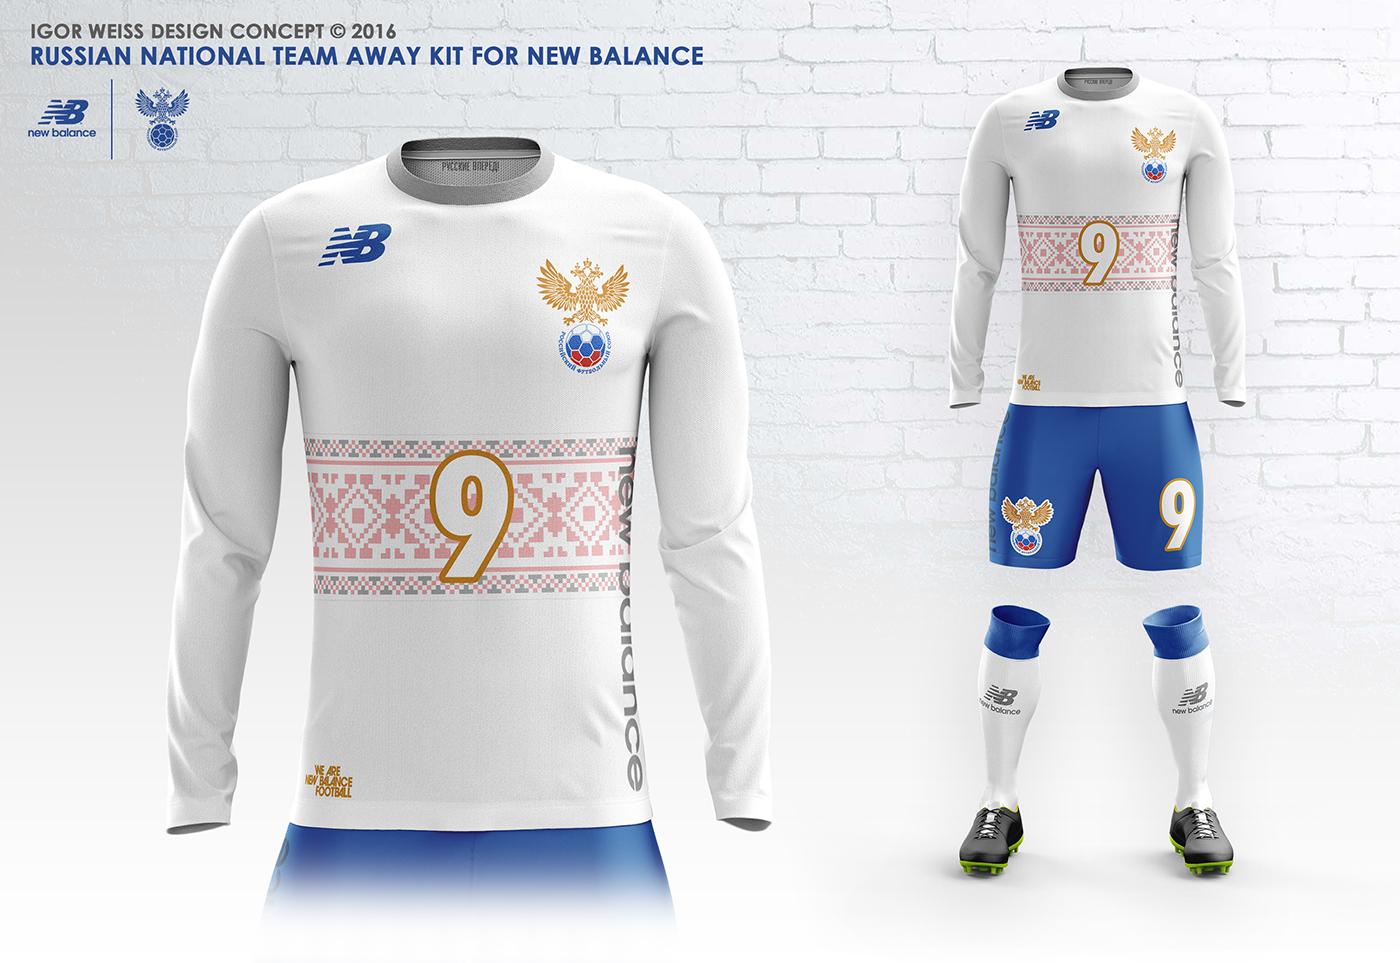 reputable site 079e7 6b6c0 RUSSIA ✕ NEW BALANCE CONCEPT KITS SOCCER-FOOTBALL on Behance